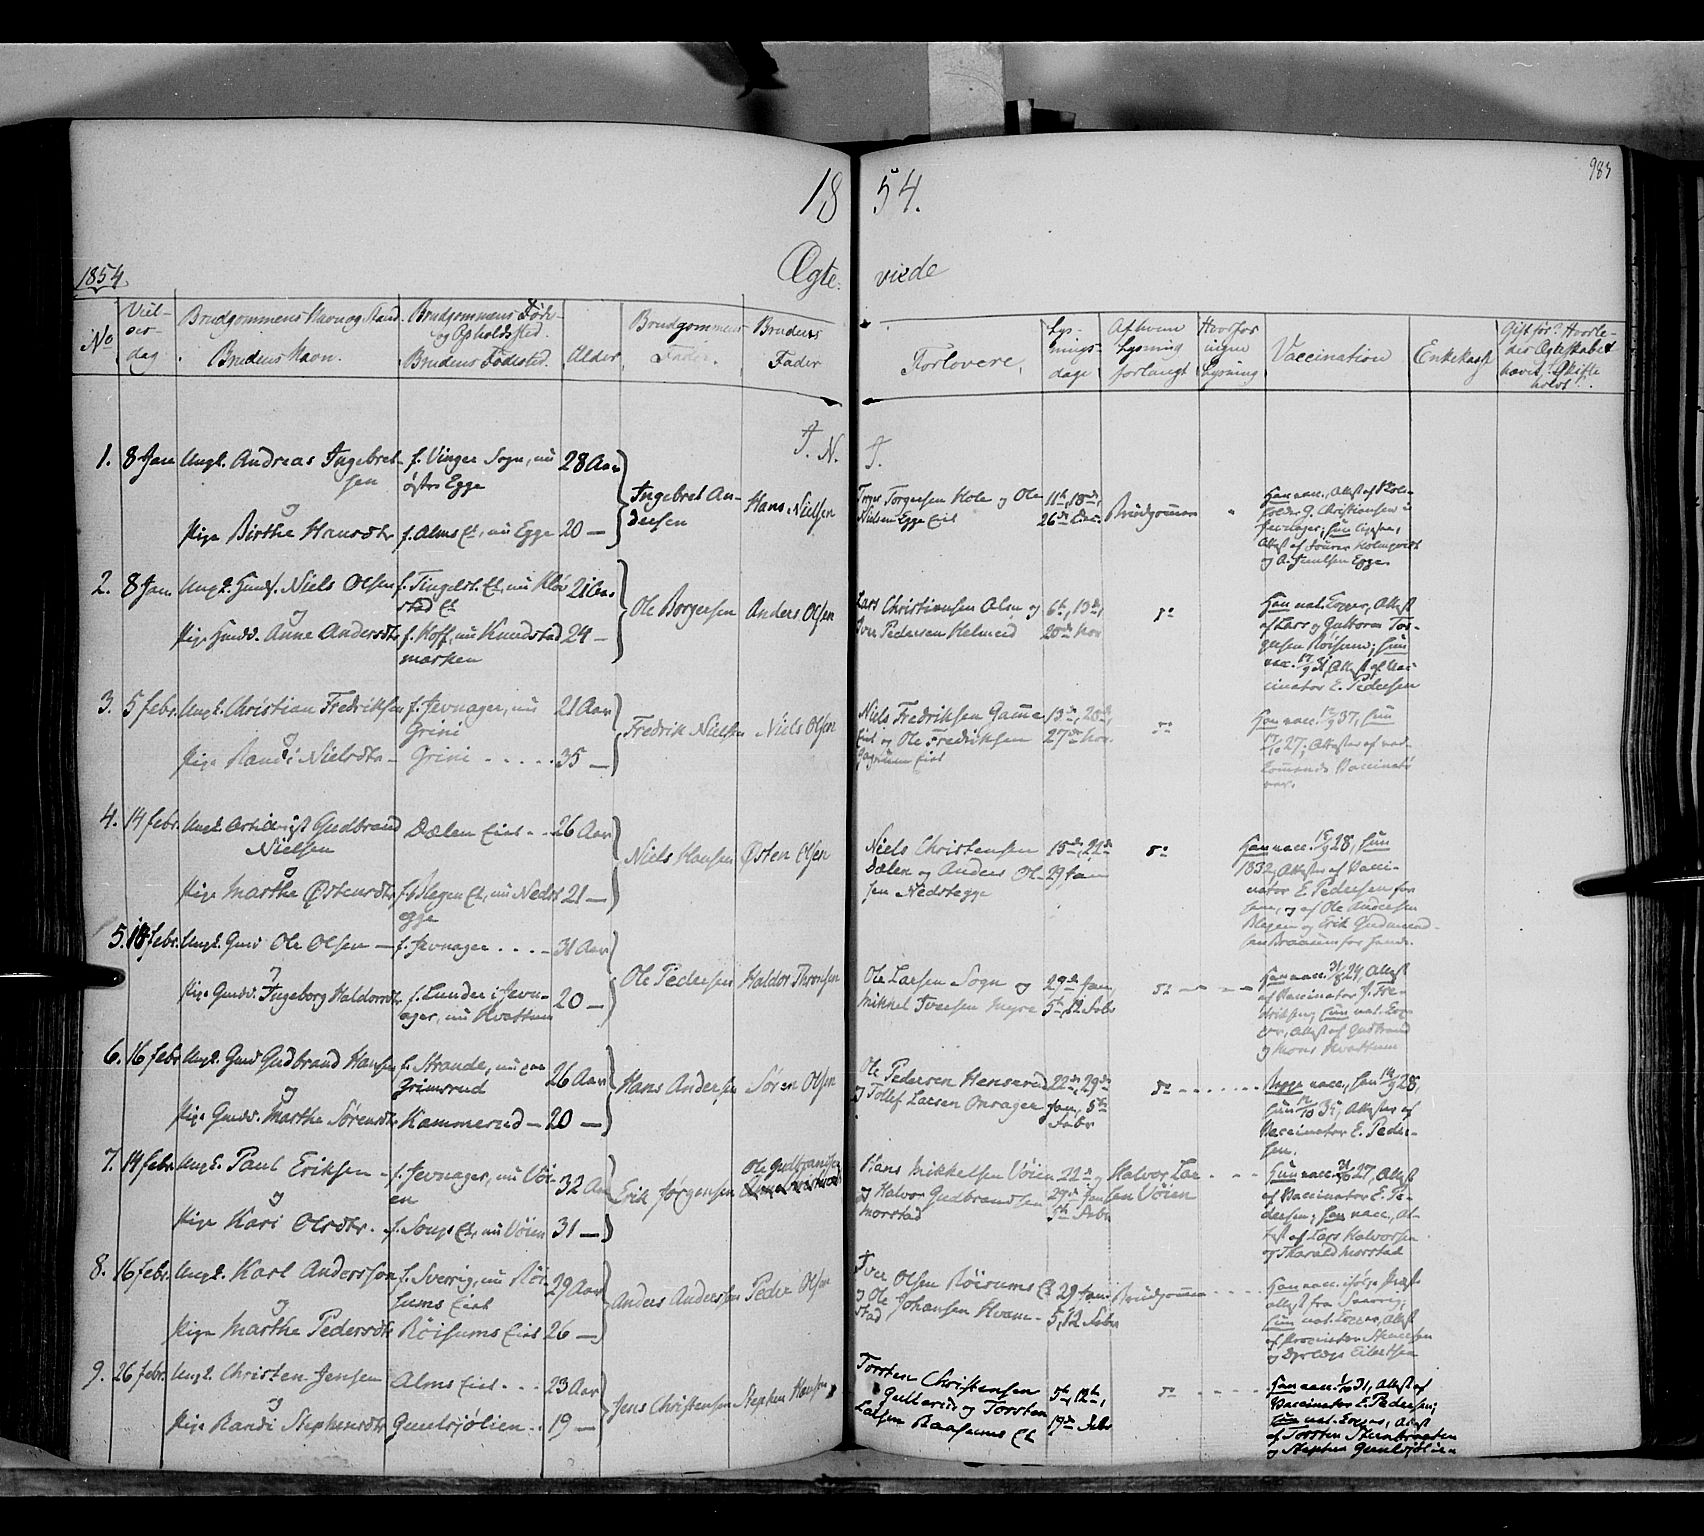 SAH, Gran prestekontor, Ministerialbok nr. 11, 1842-1856, s. 982-983